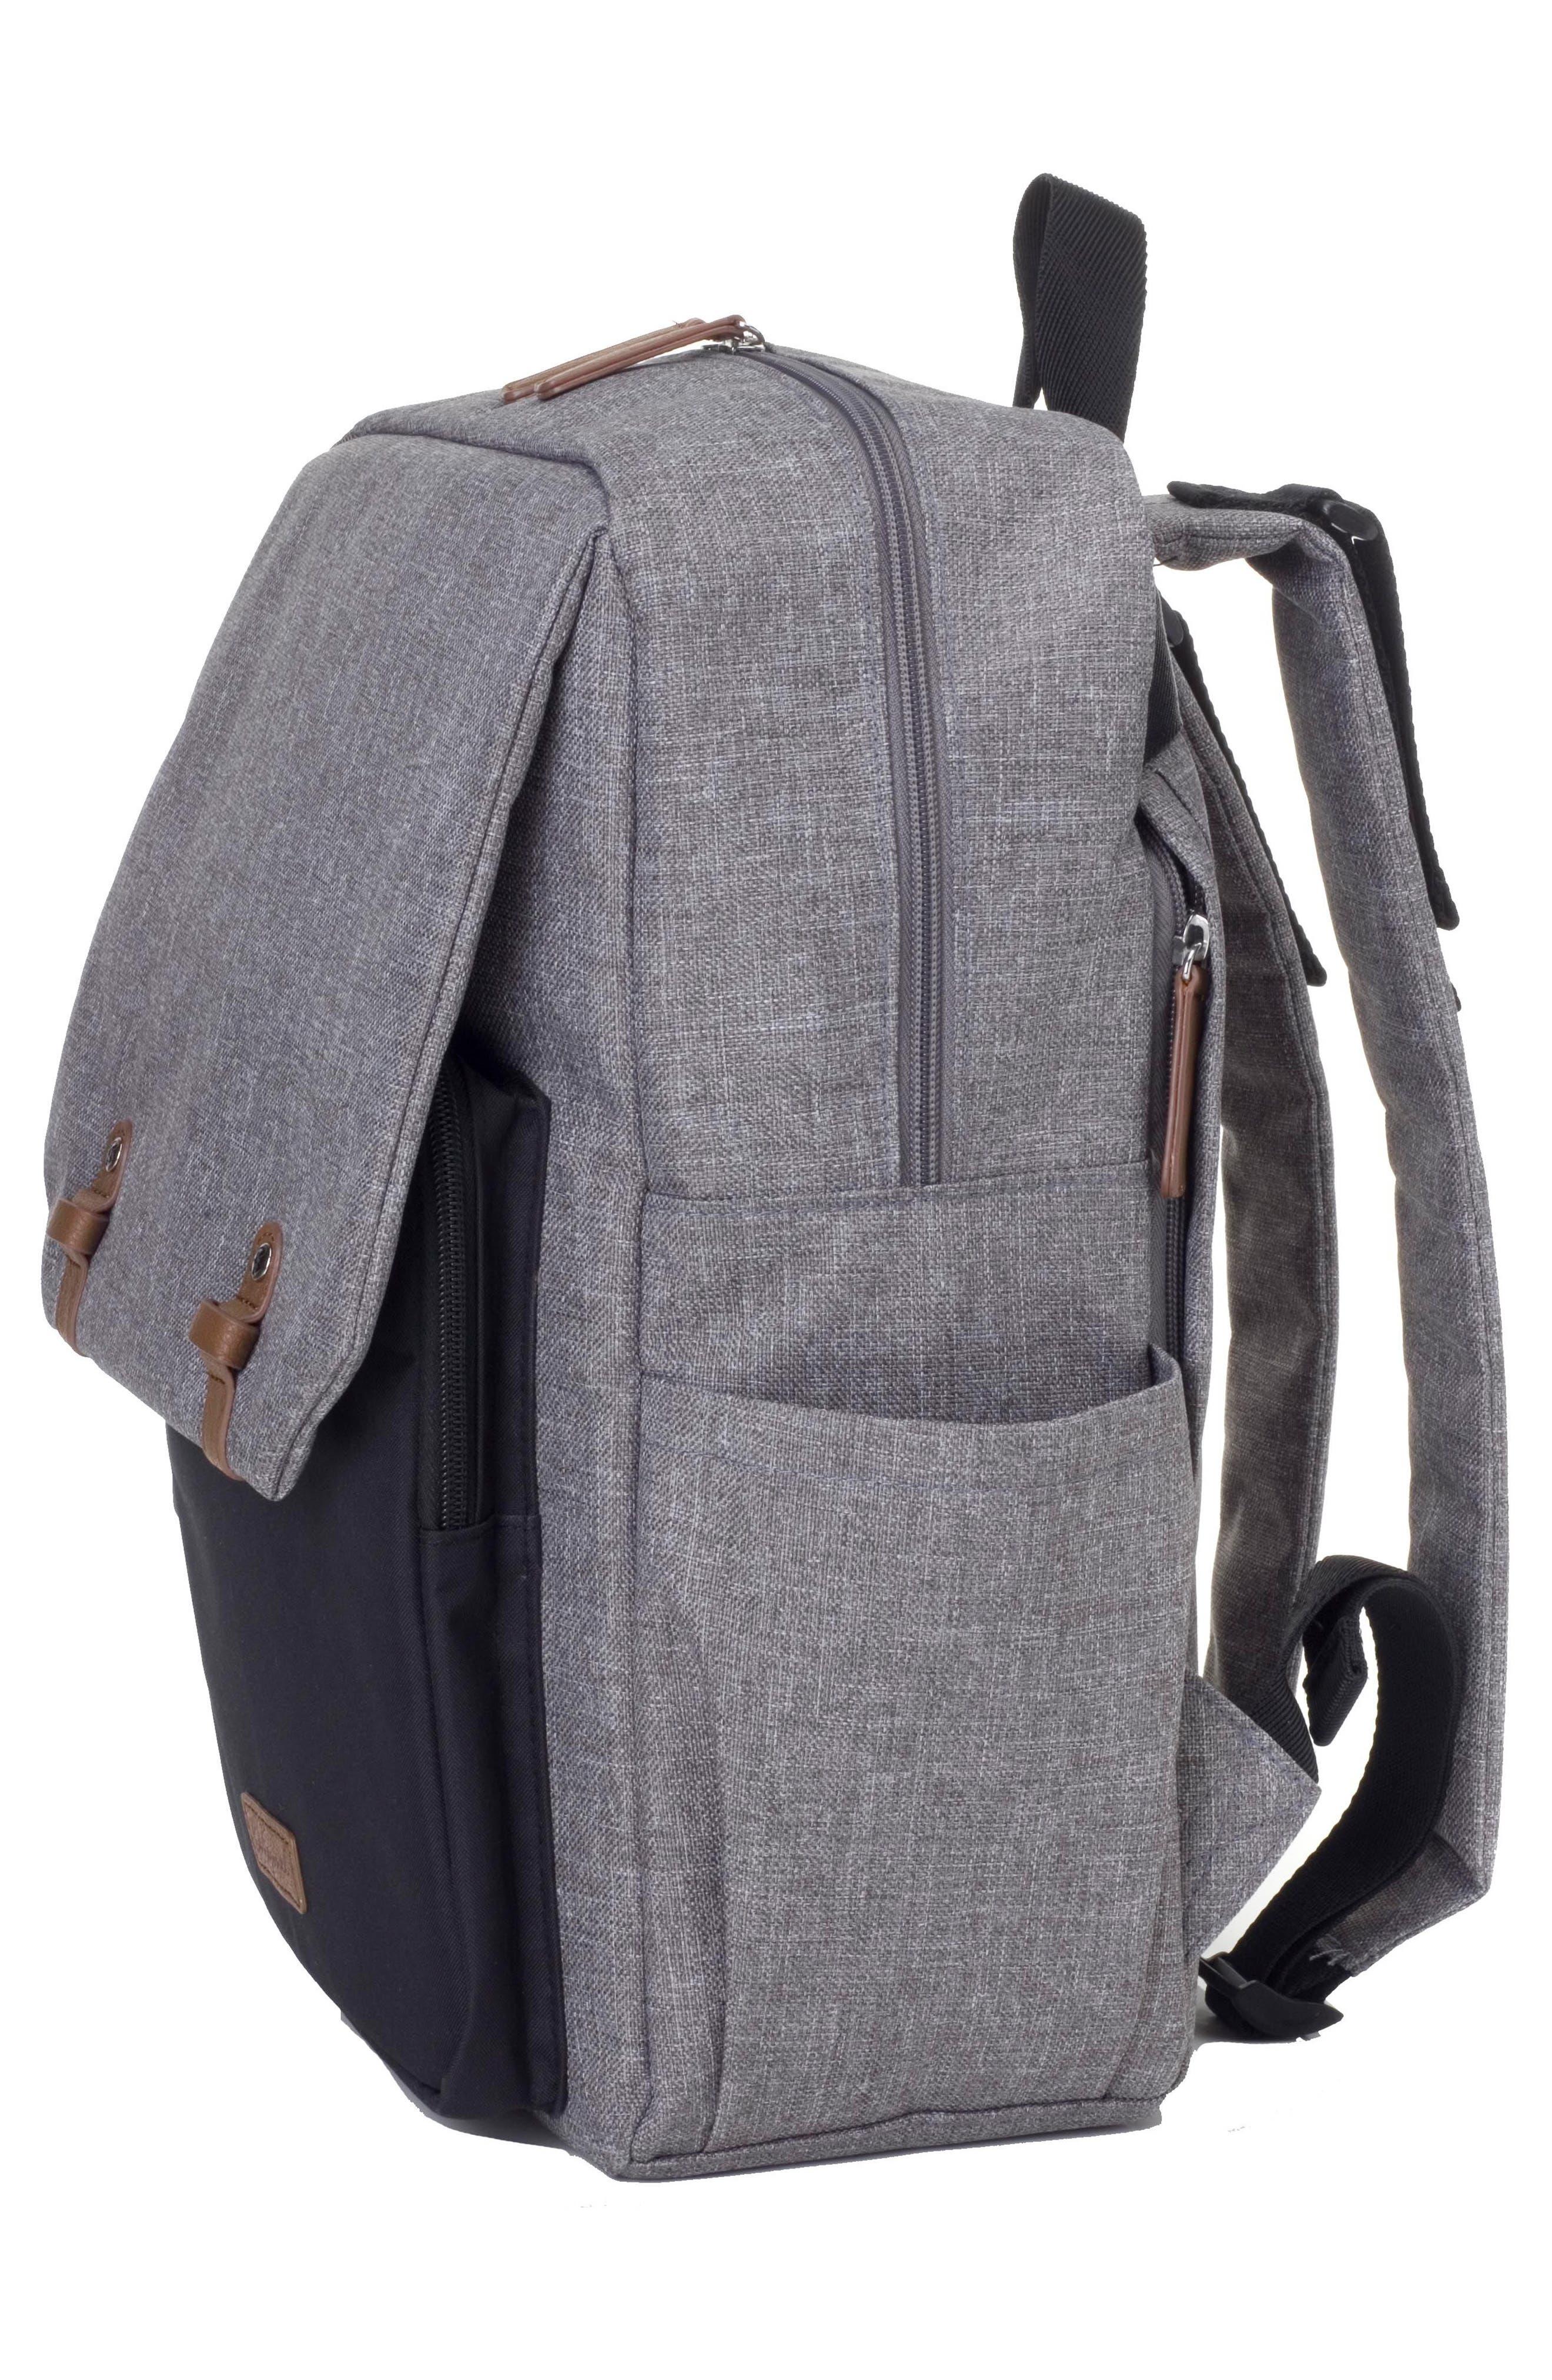 George Water Resistant Diaper Backpack,                             Alternate thumbnail 6, color,                             BLACK/ GREY